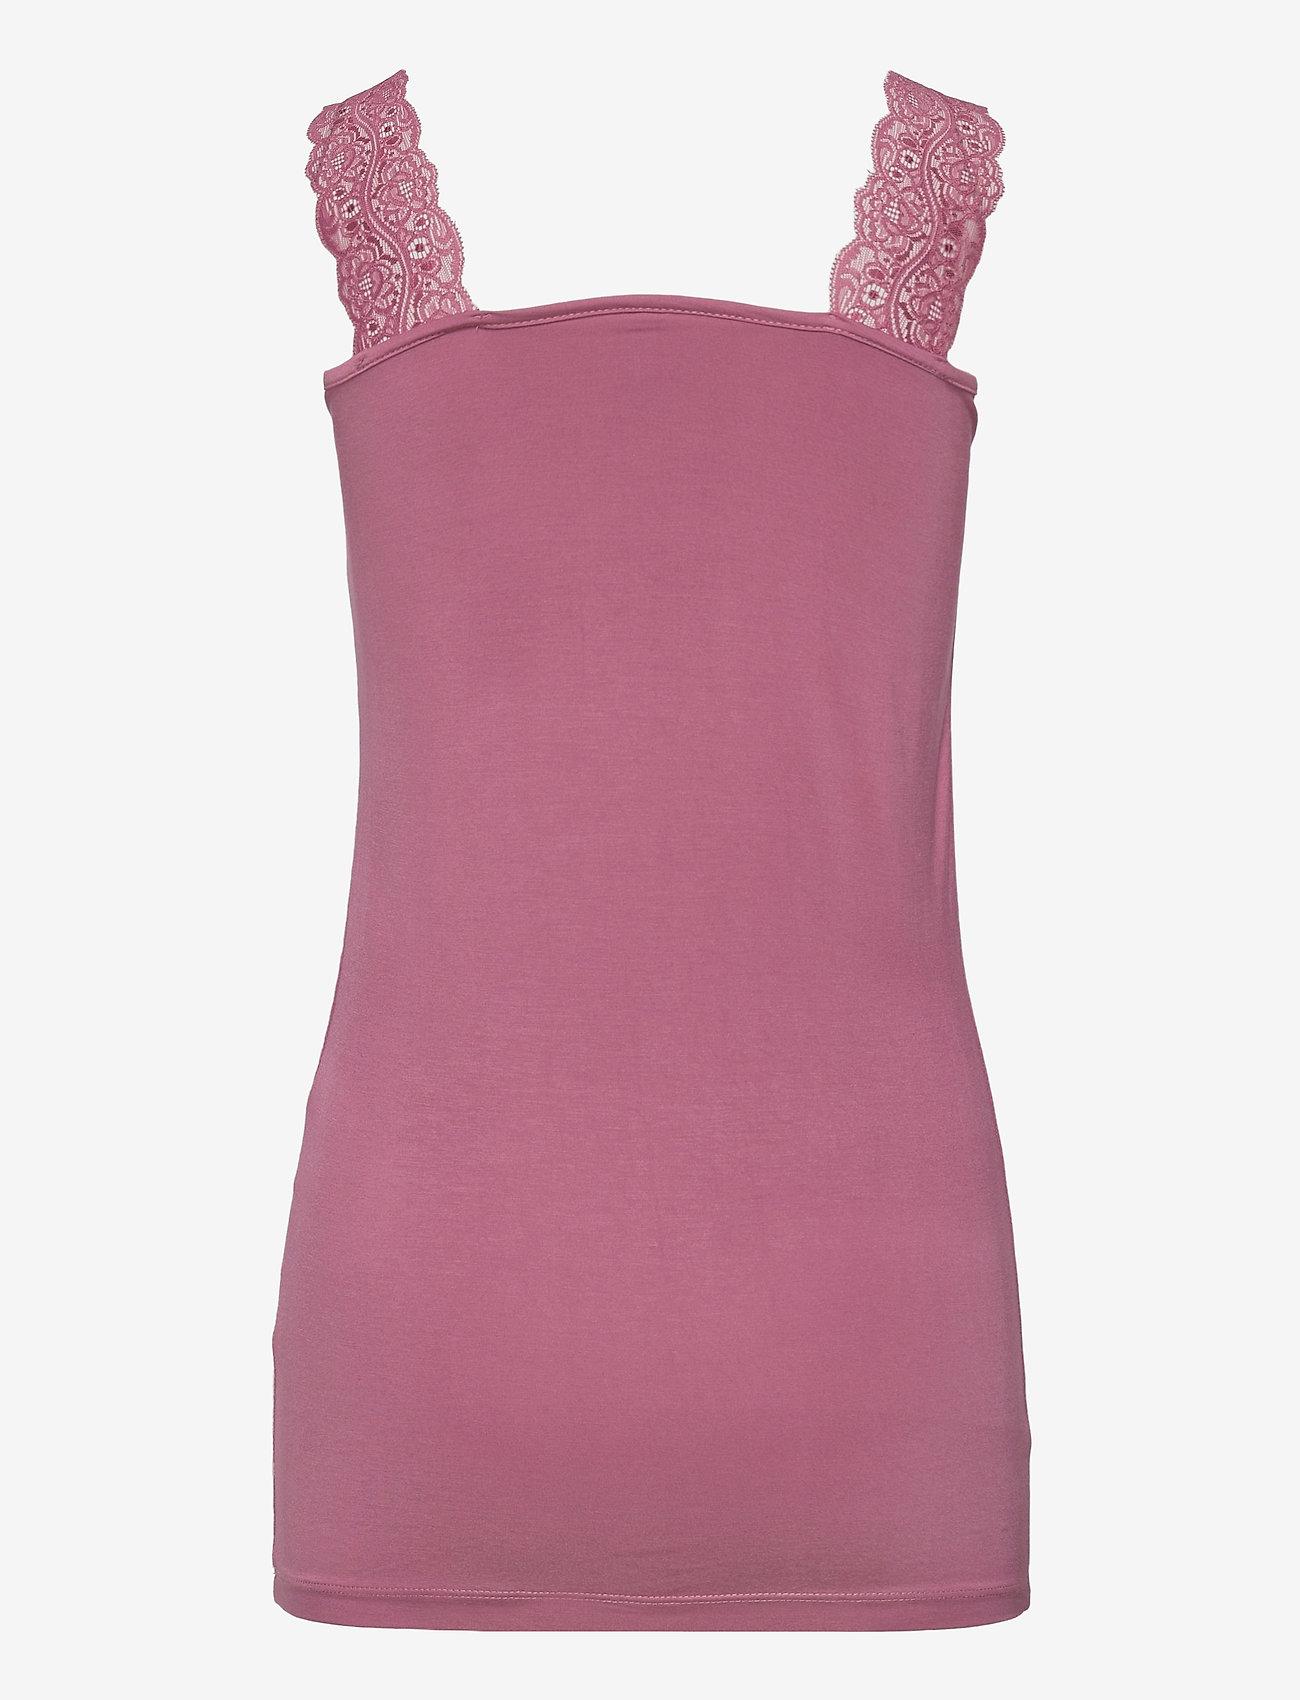 Soyaconcept - SC-MARICA - t-shirt & tops - dark pink rose - 1